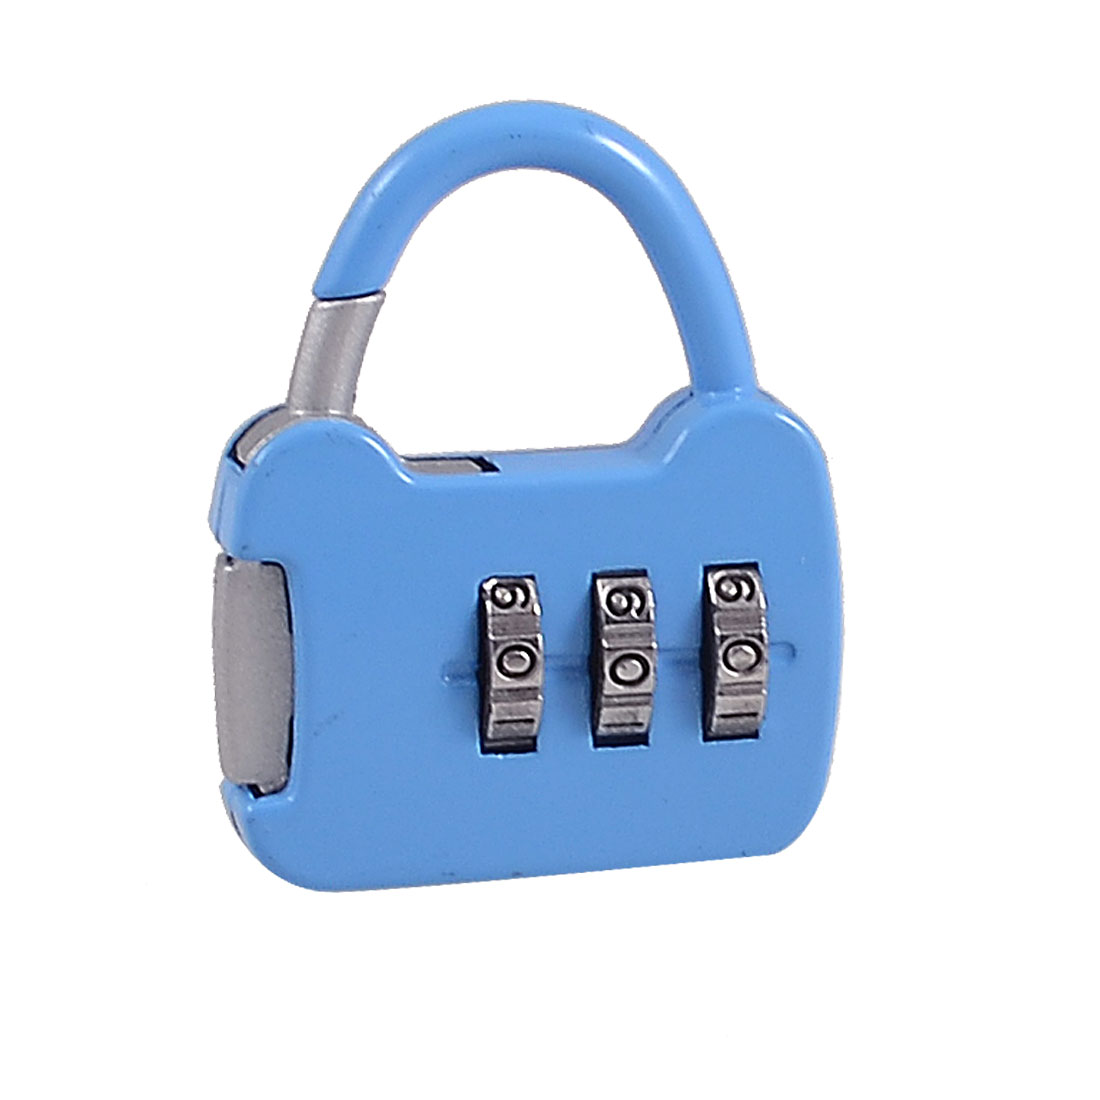 Handbag Shape Three Digits Combination Code Password Padlock Blue